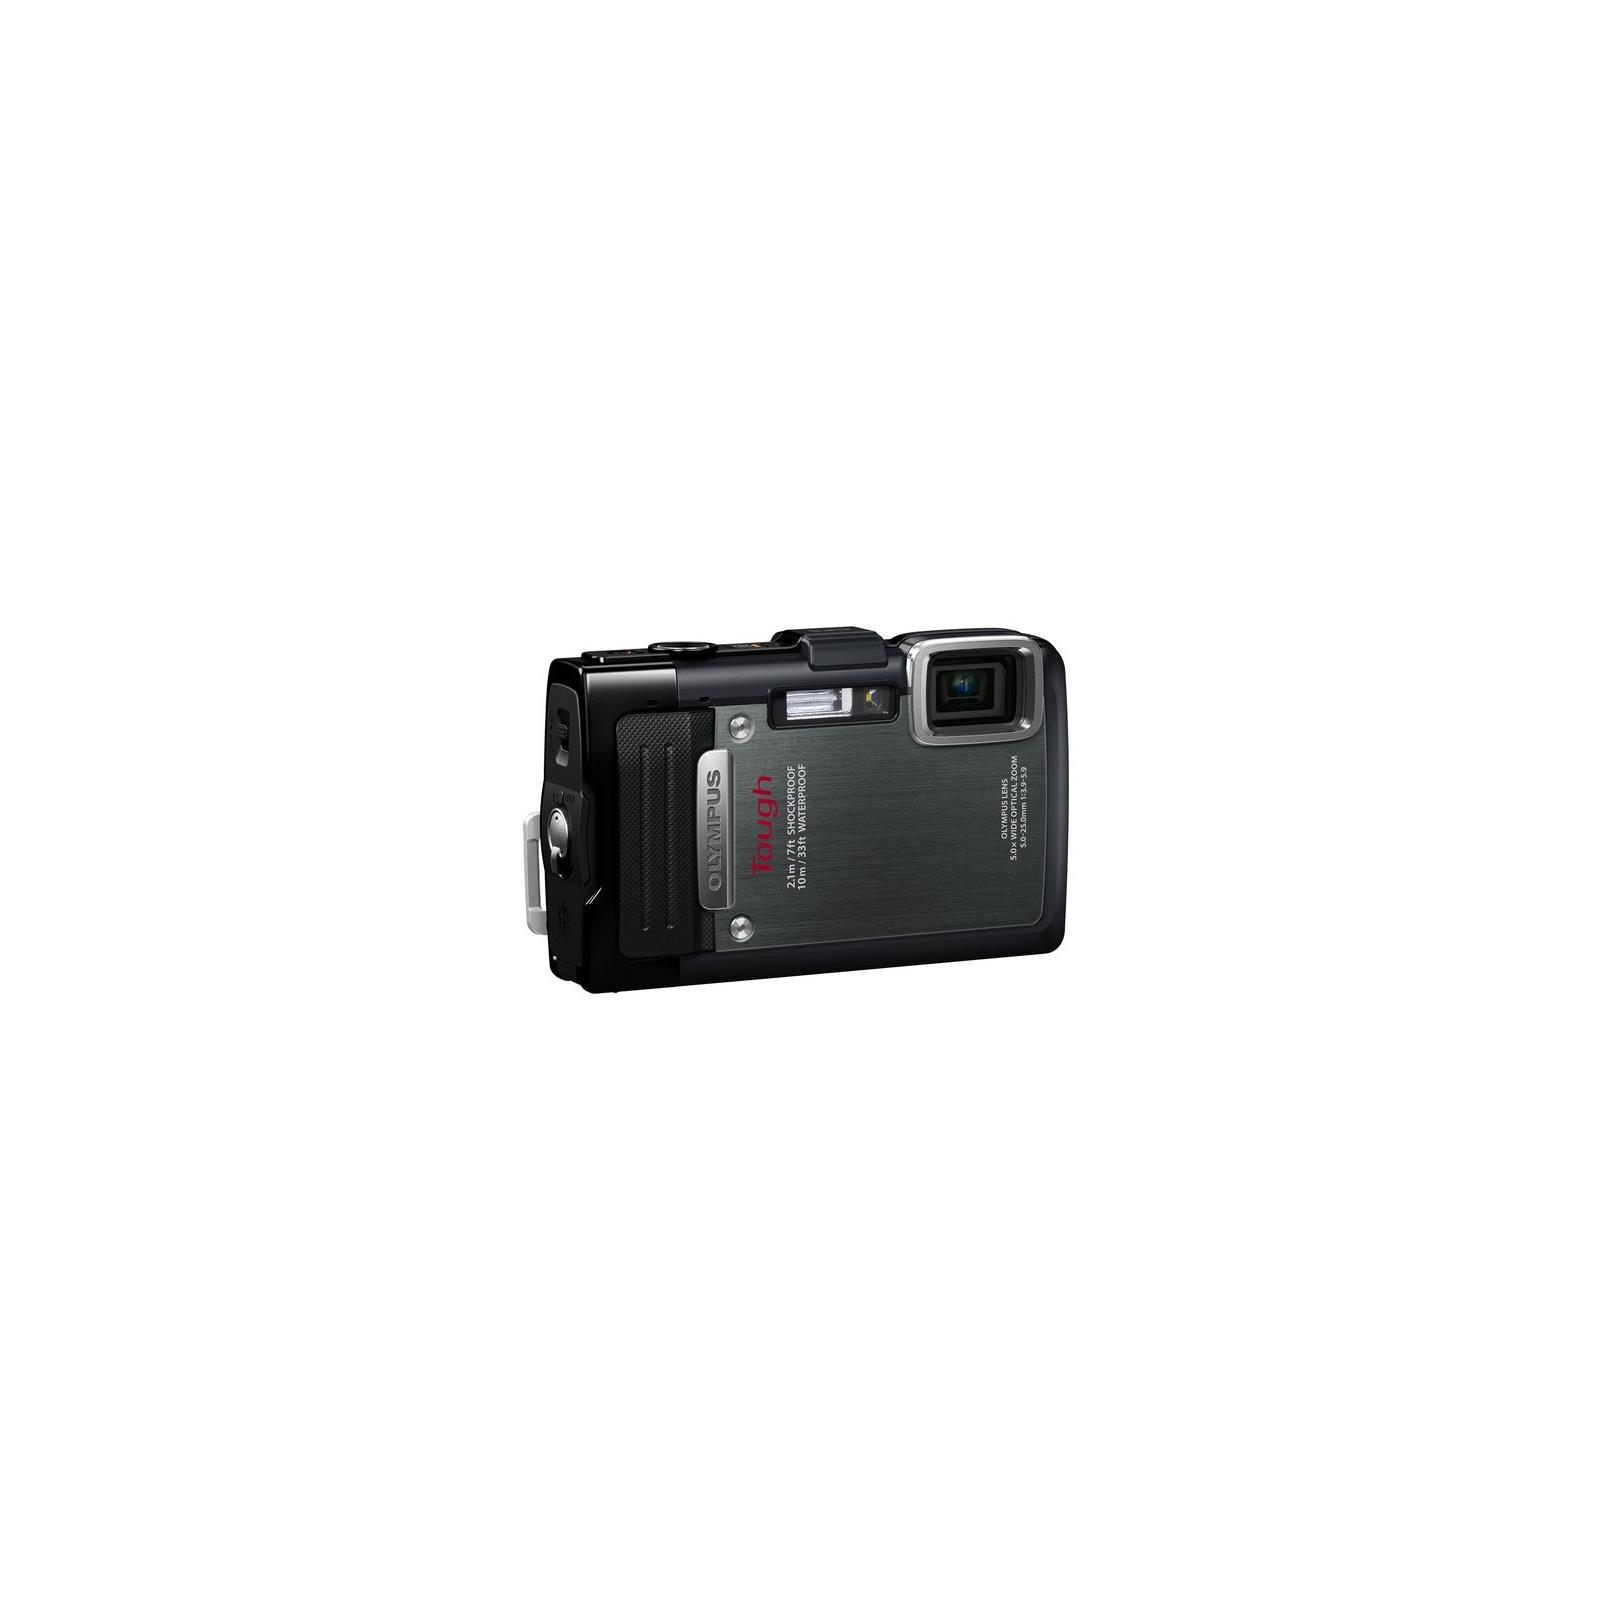 Цифровой фотоаппарат OLYMPUS TG-835 Black (Waterproof - 10m; GPS) (V104131BE000) изображение 3